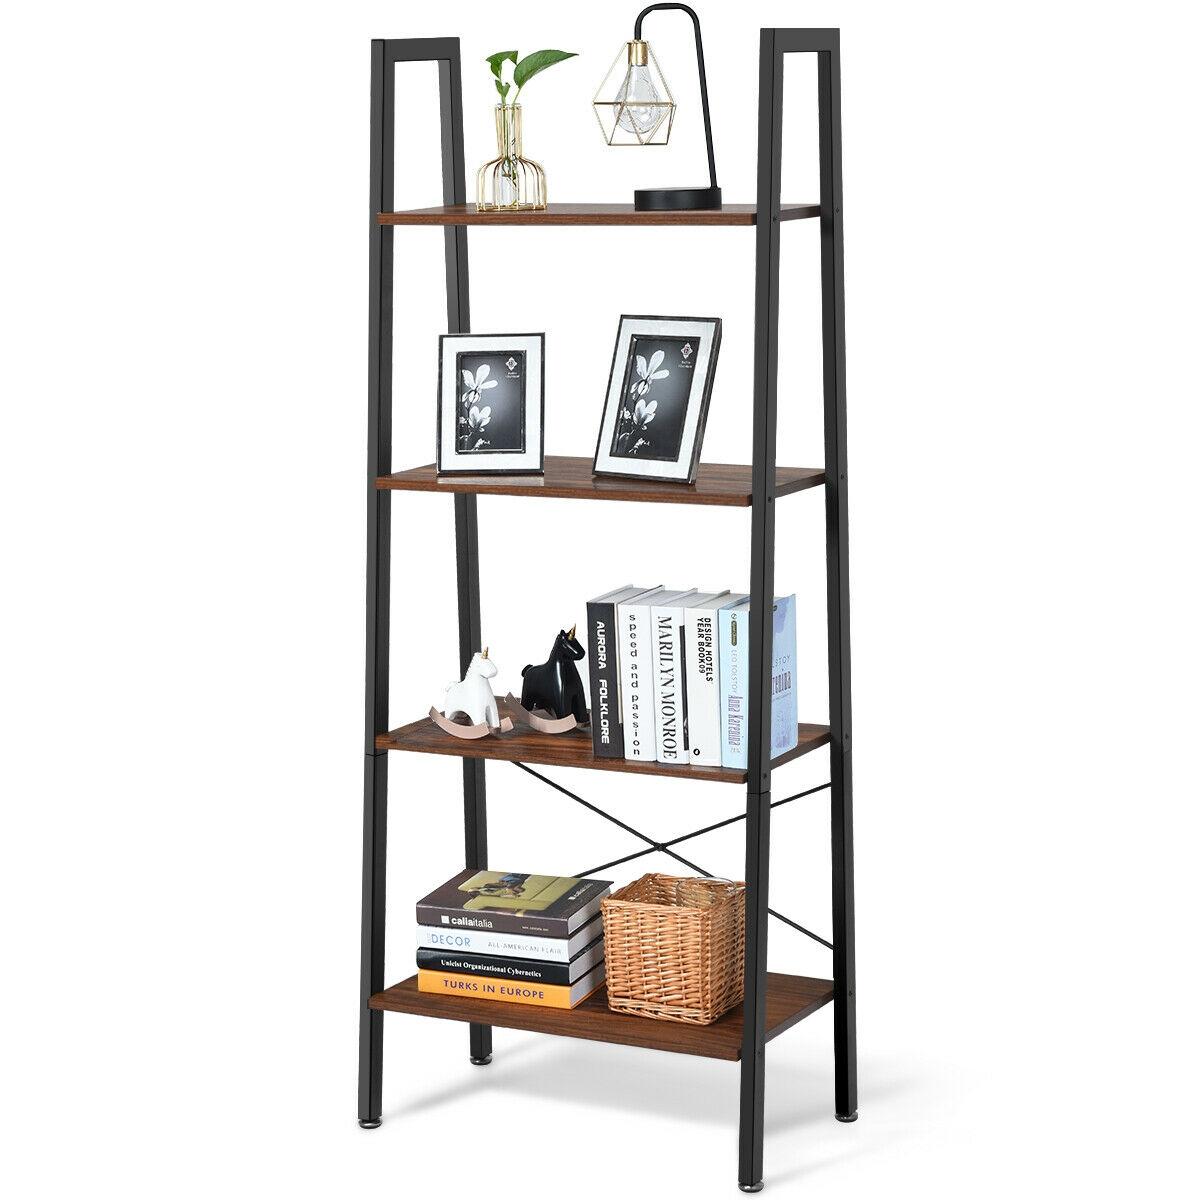 4-Tier Ladder Shelf Bookcase Bookshelf Display Rack Plant Stand